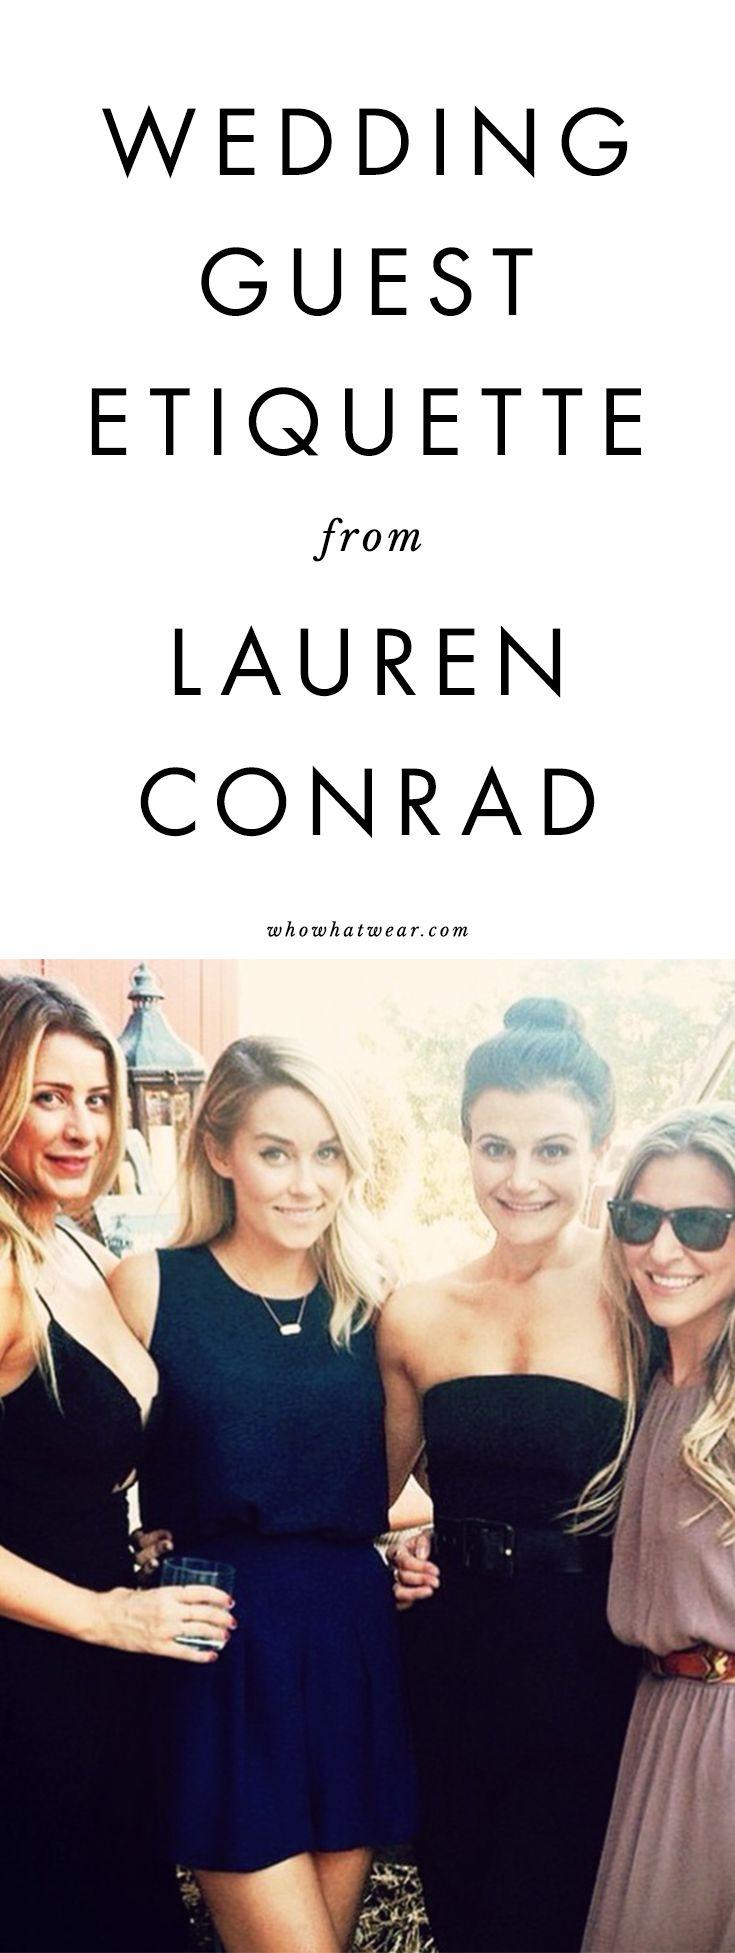 Wedding guest etiquette from Lauren Conrad